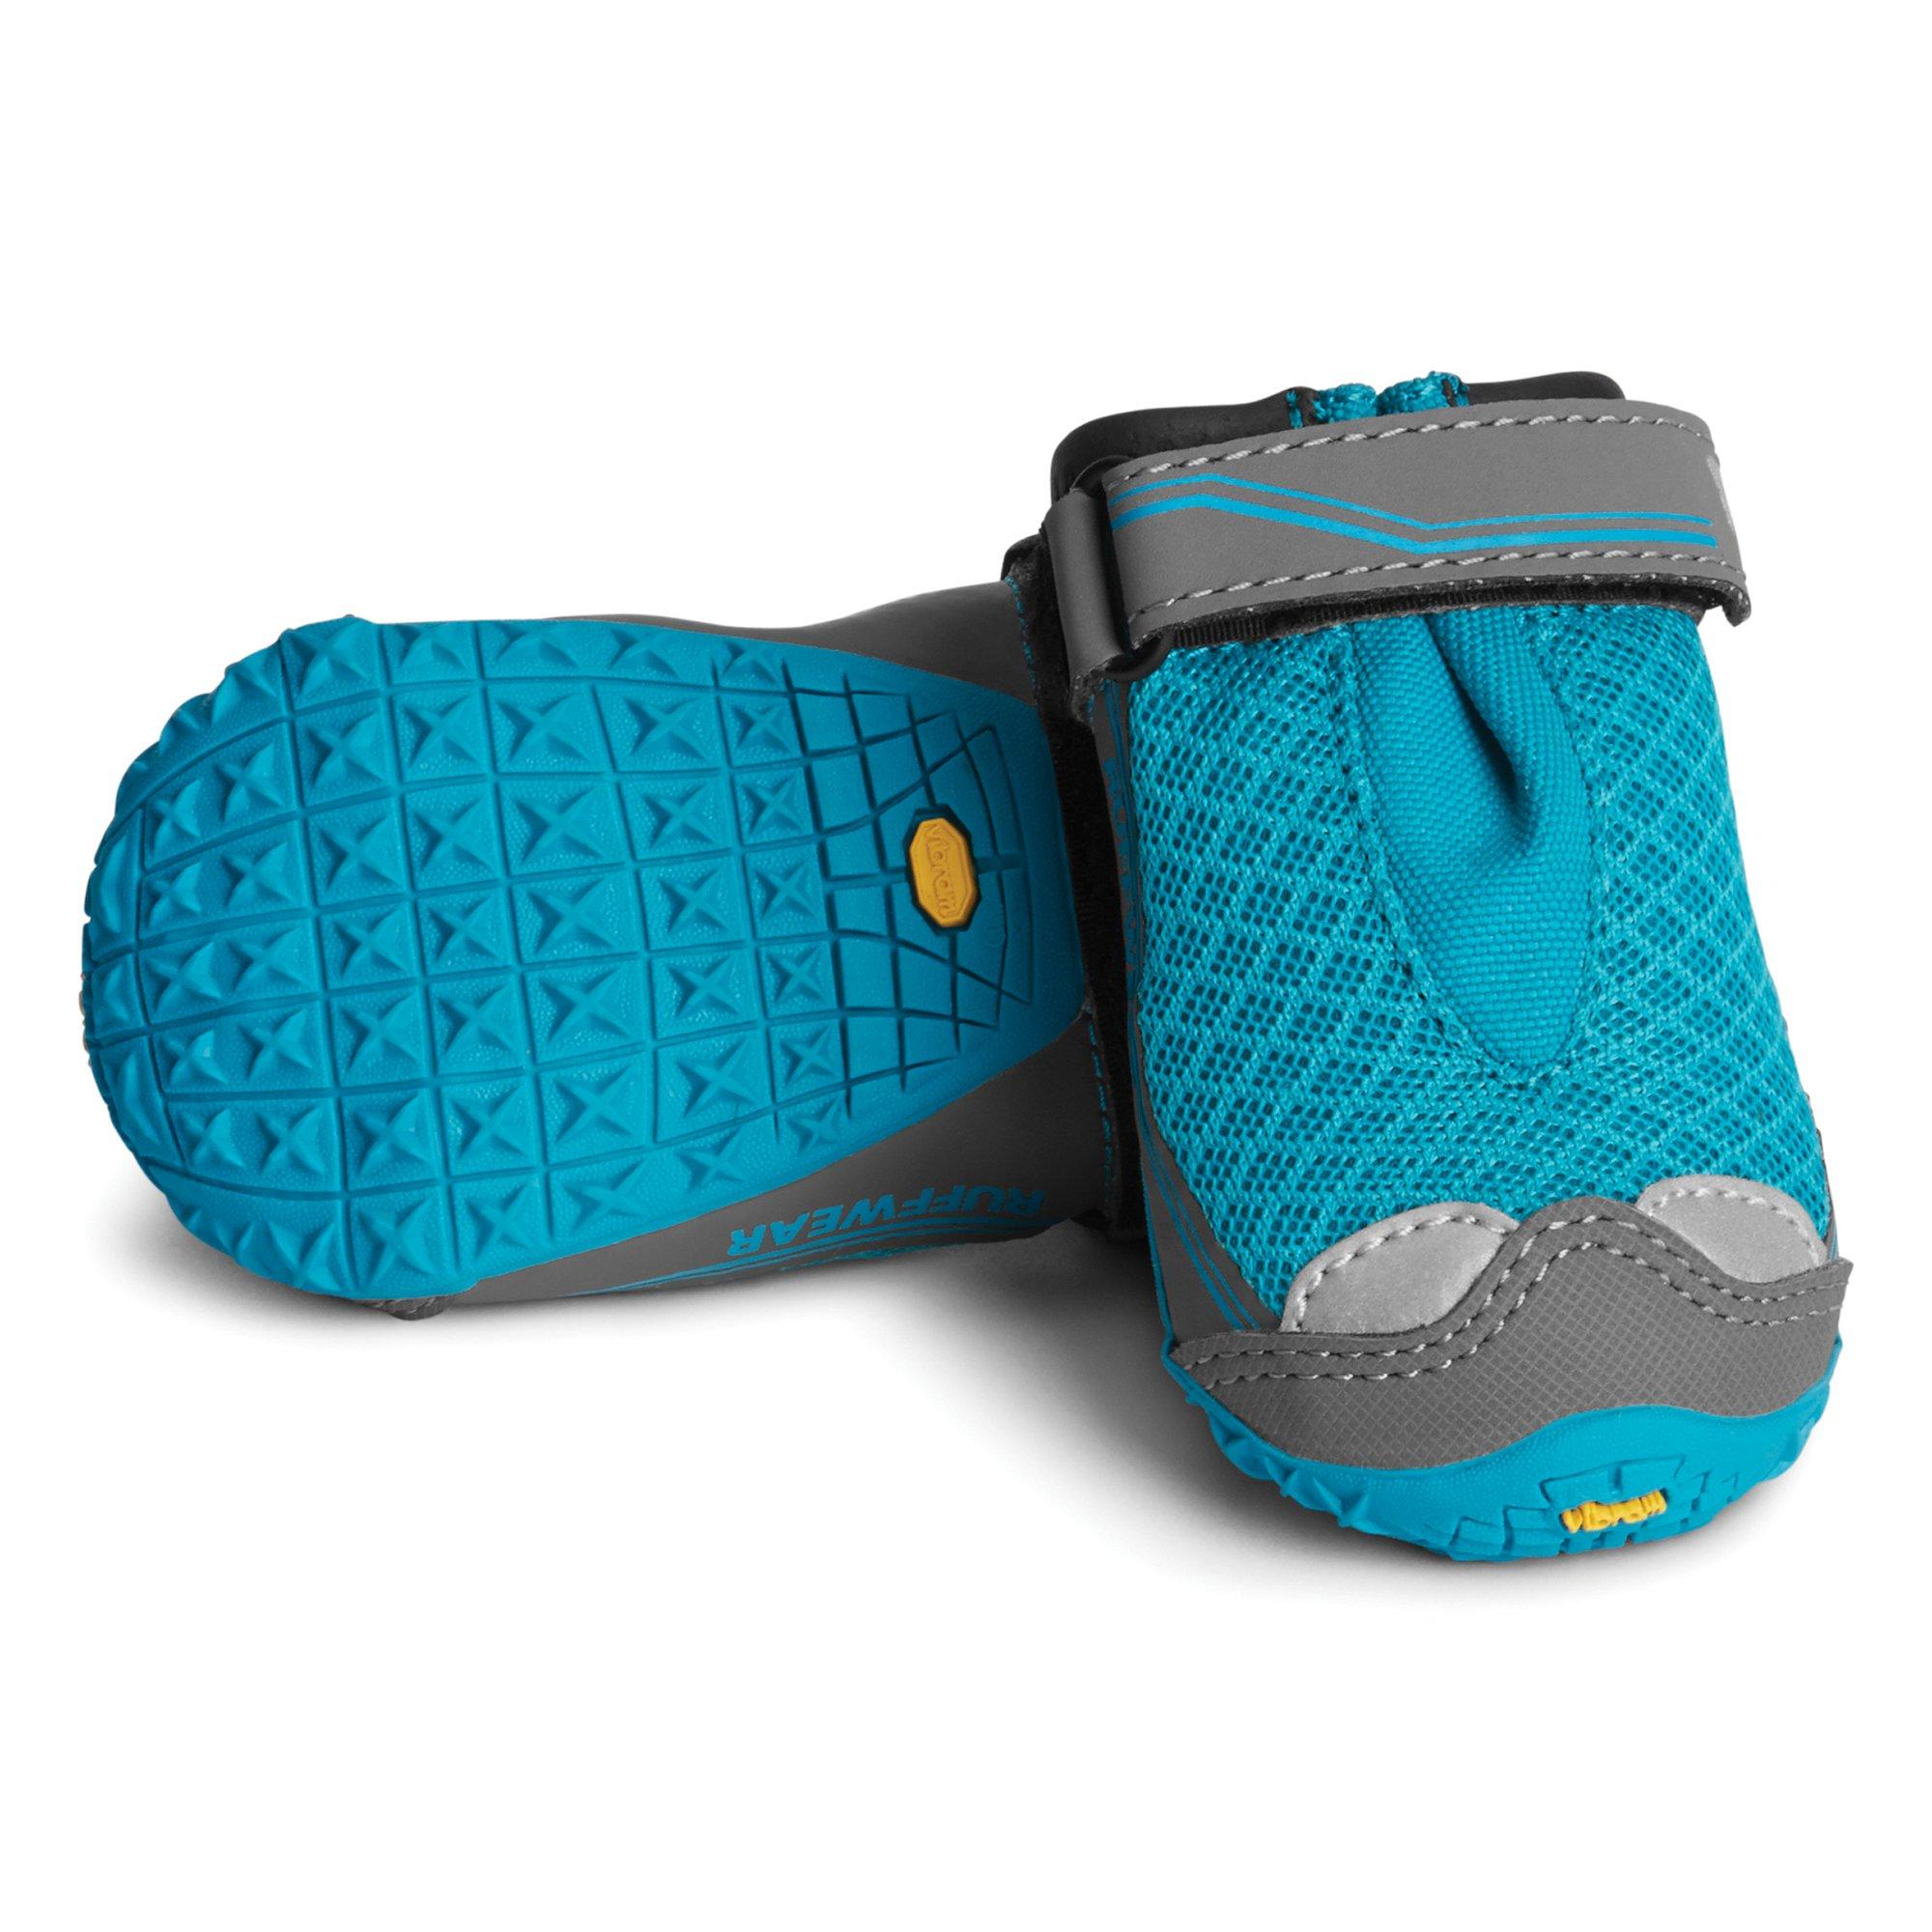 RUFFWEAR - Grip Trex, Blue Spring, 2.0 in (2 Boots)